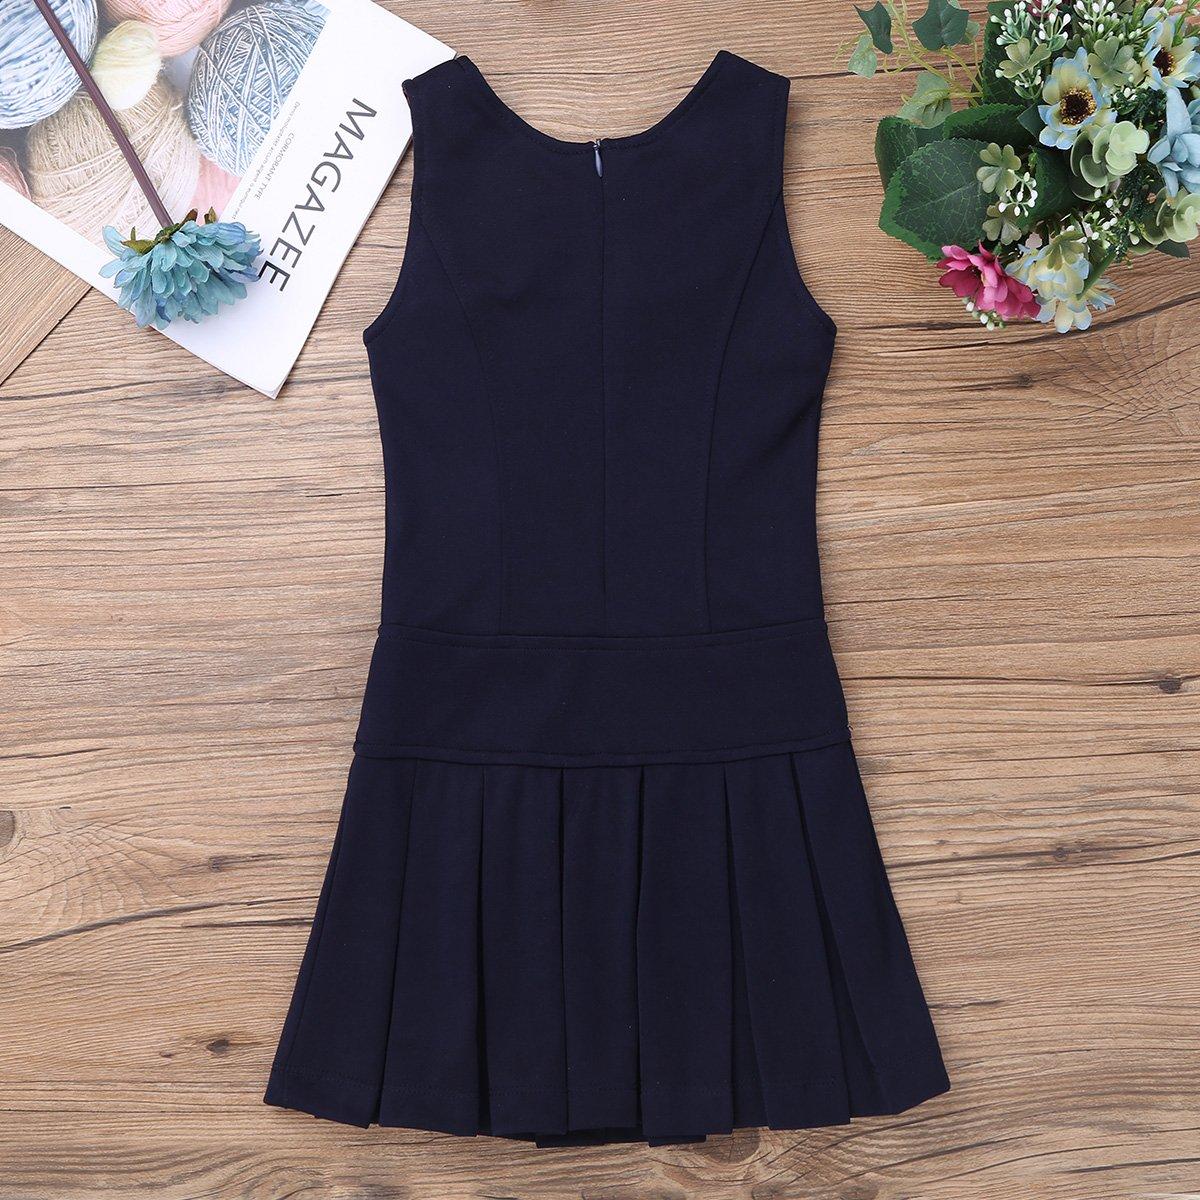 iEFiEL Kids Girls Stretchy Pleated Hem School Uniform Jumper Buttons Dress